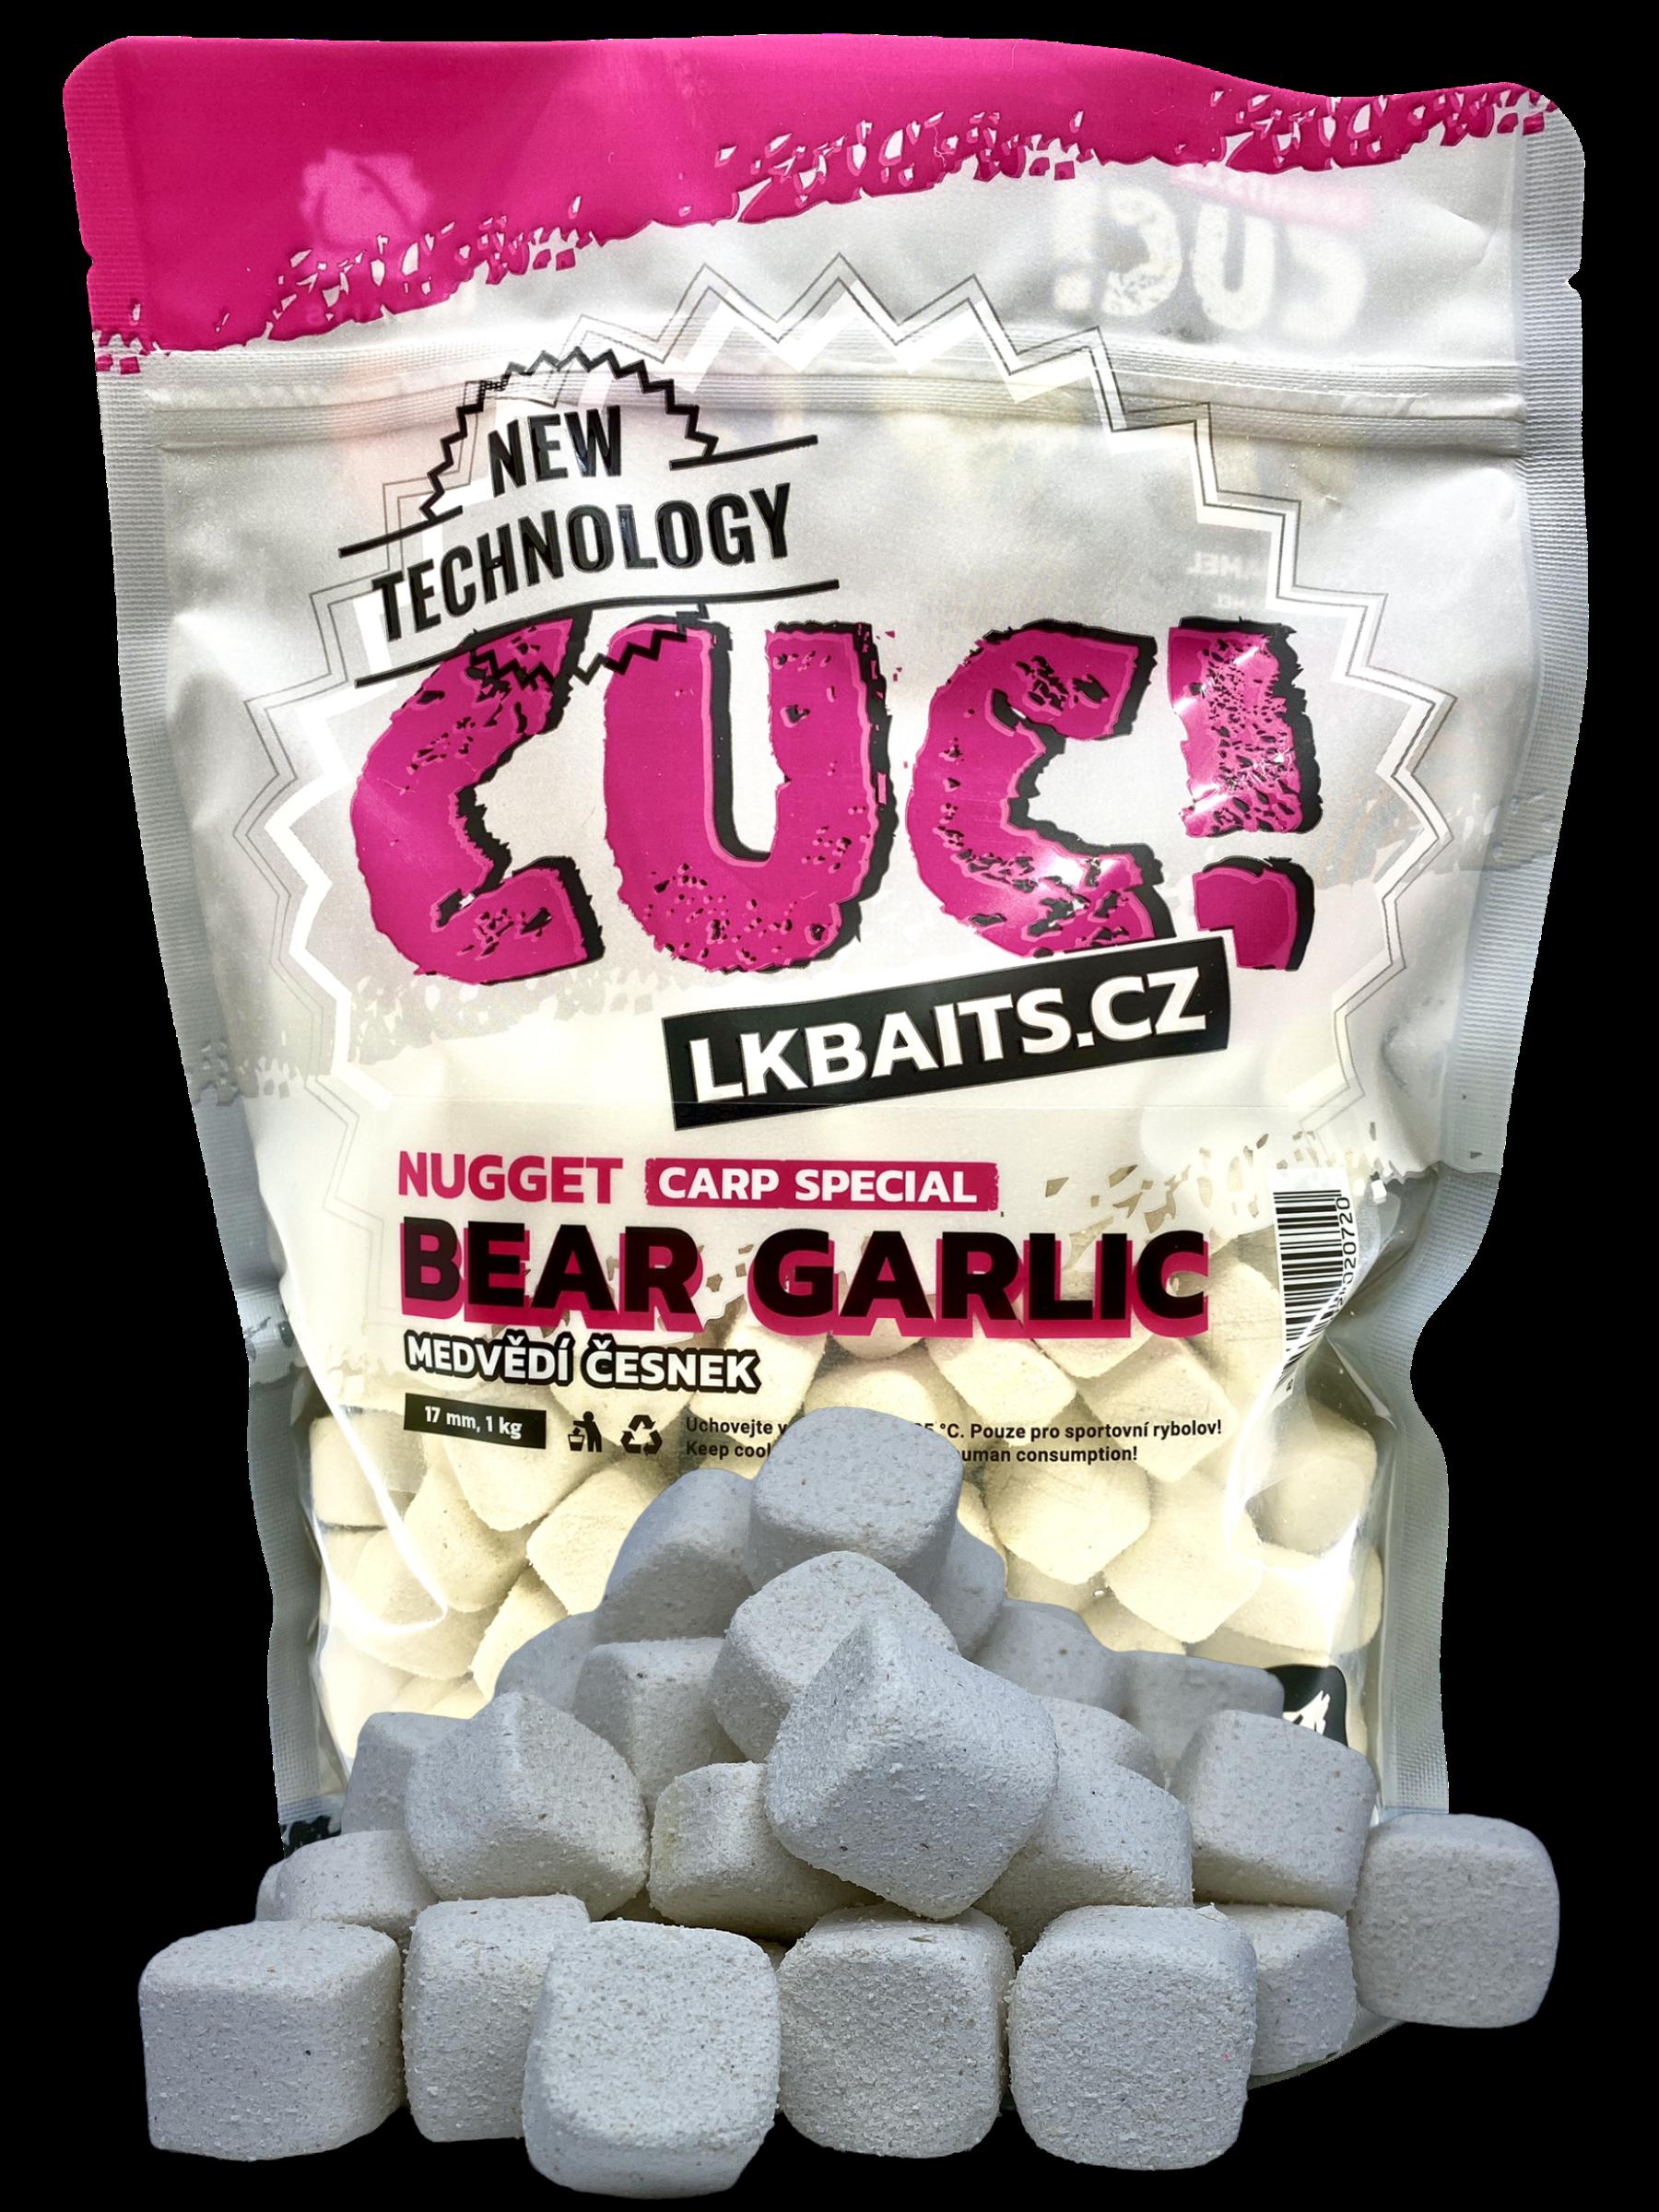 LK Baits CUC! Nugget Carp Garlic Bear 17 mm, 1kg